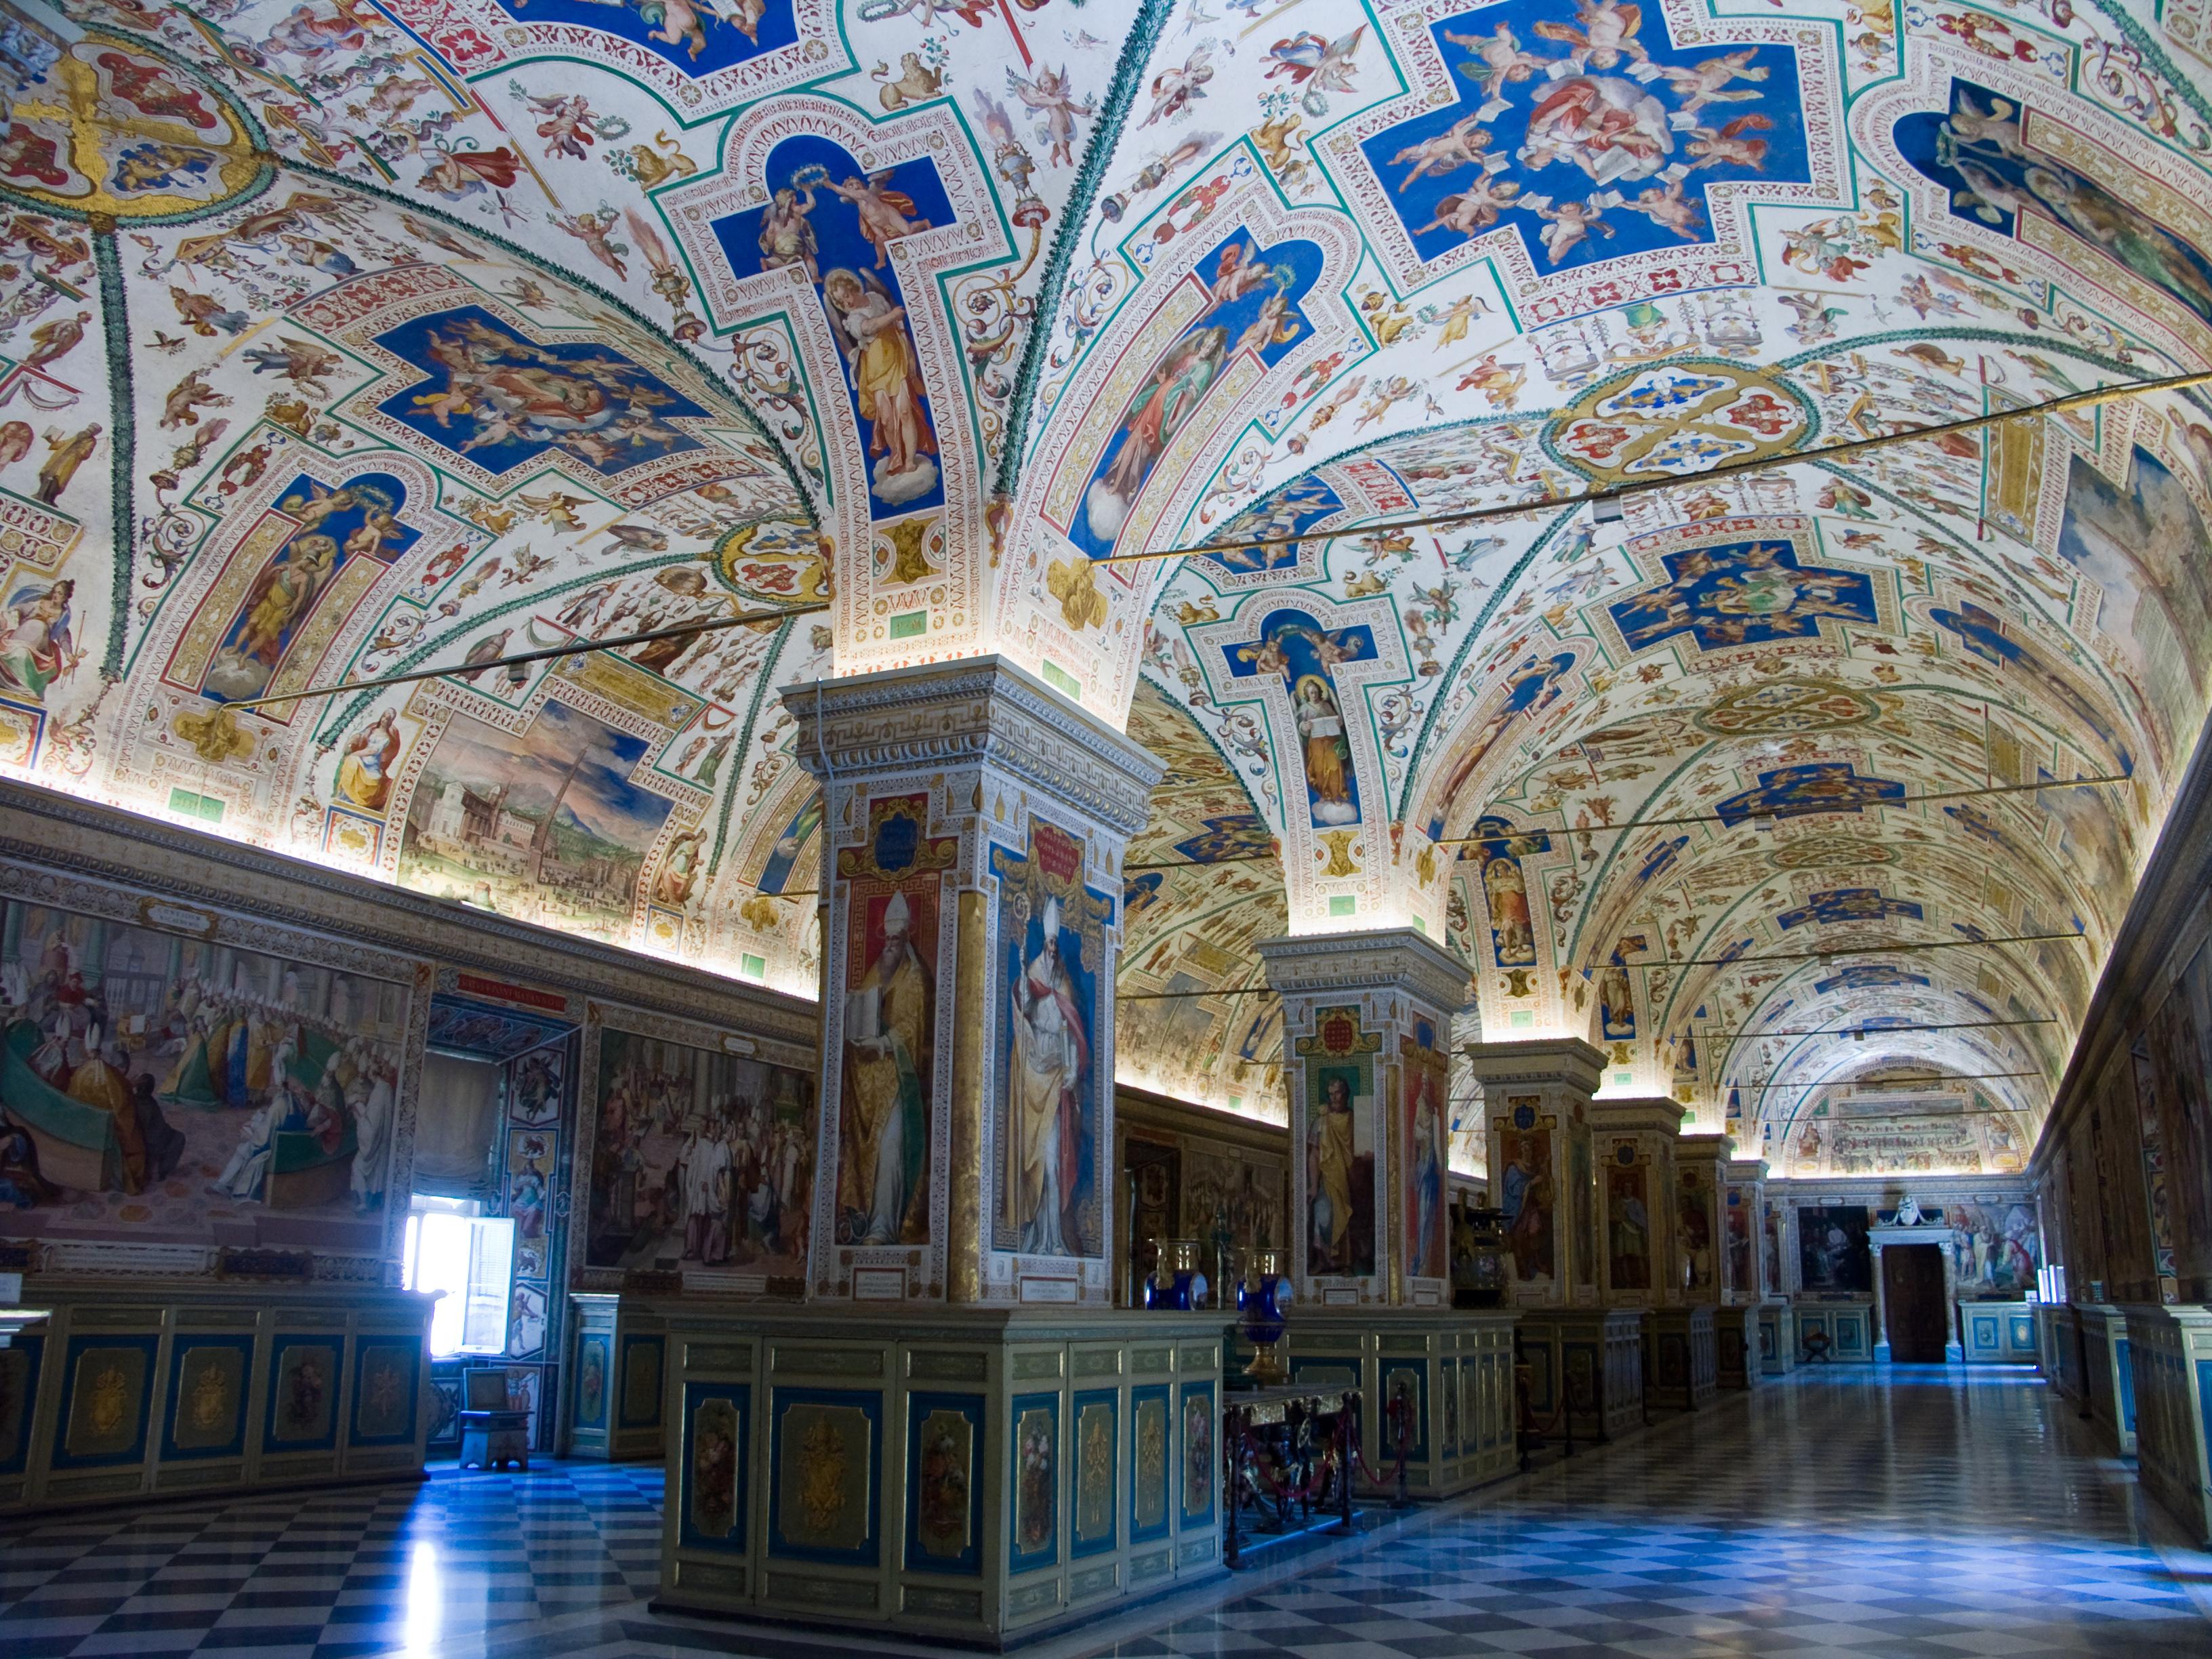 File:Vatican-Musée-Intérieur.jpg - Wikimedia Commons: commons.wikimedia.org/wiki/File:Vatican-Musée-Intérieur.jpg